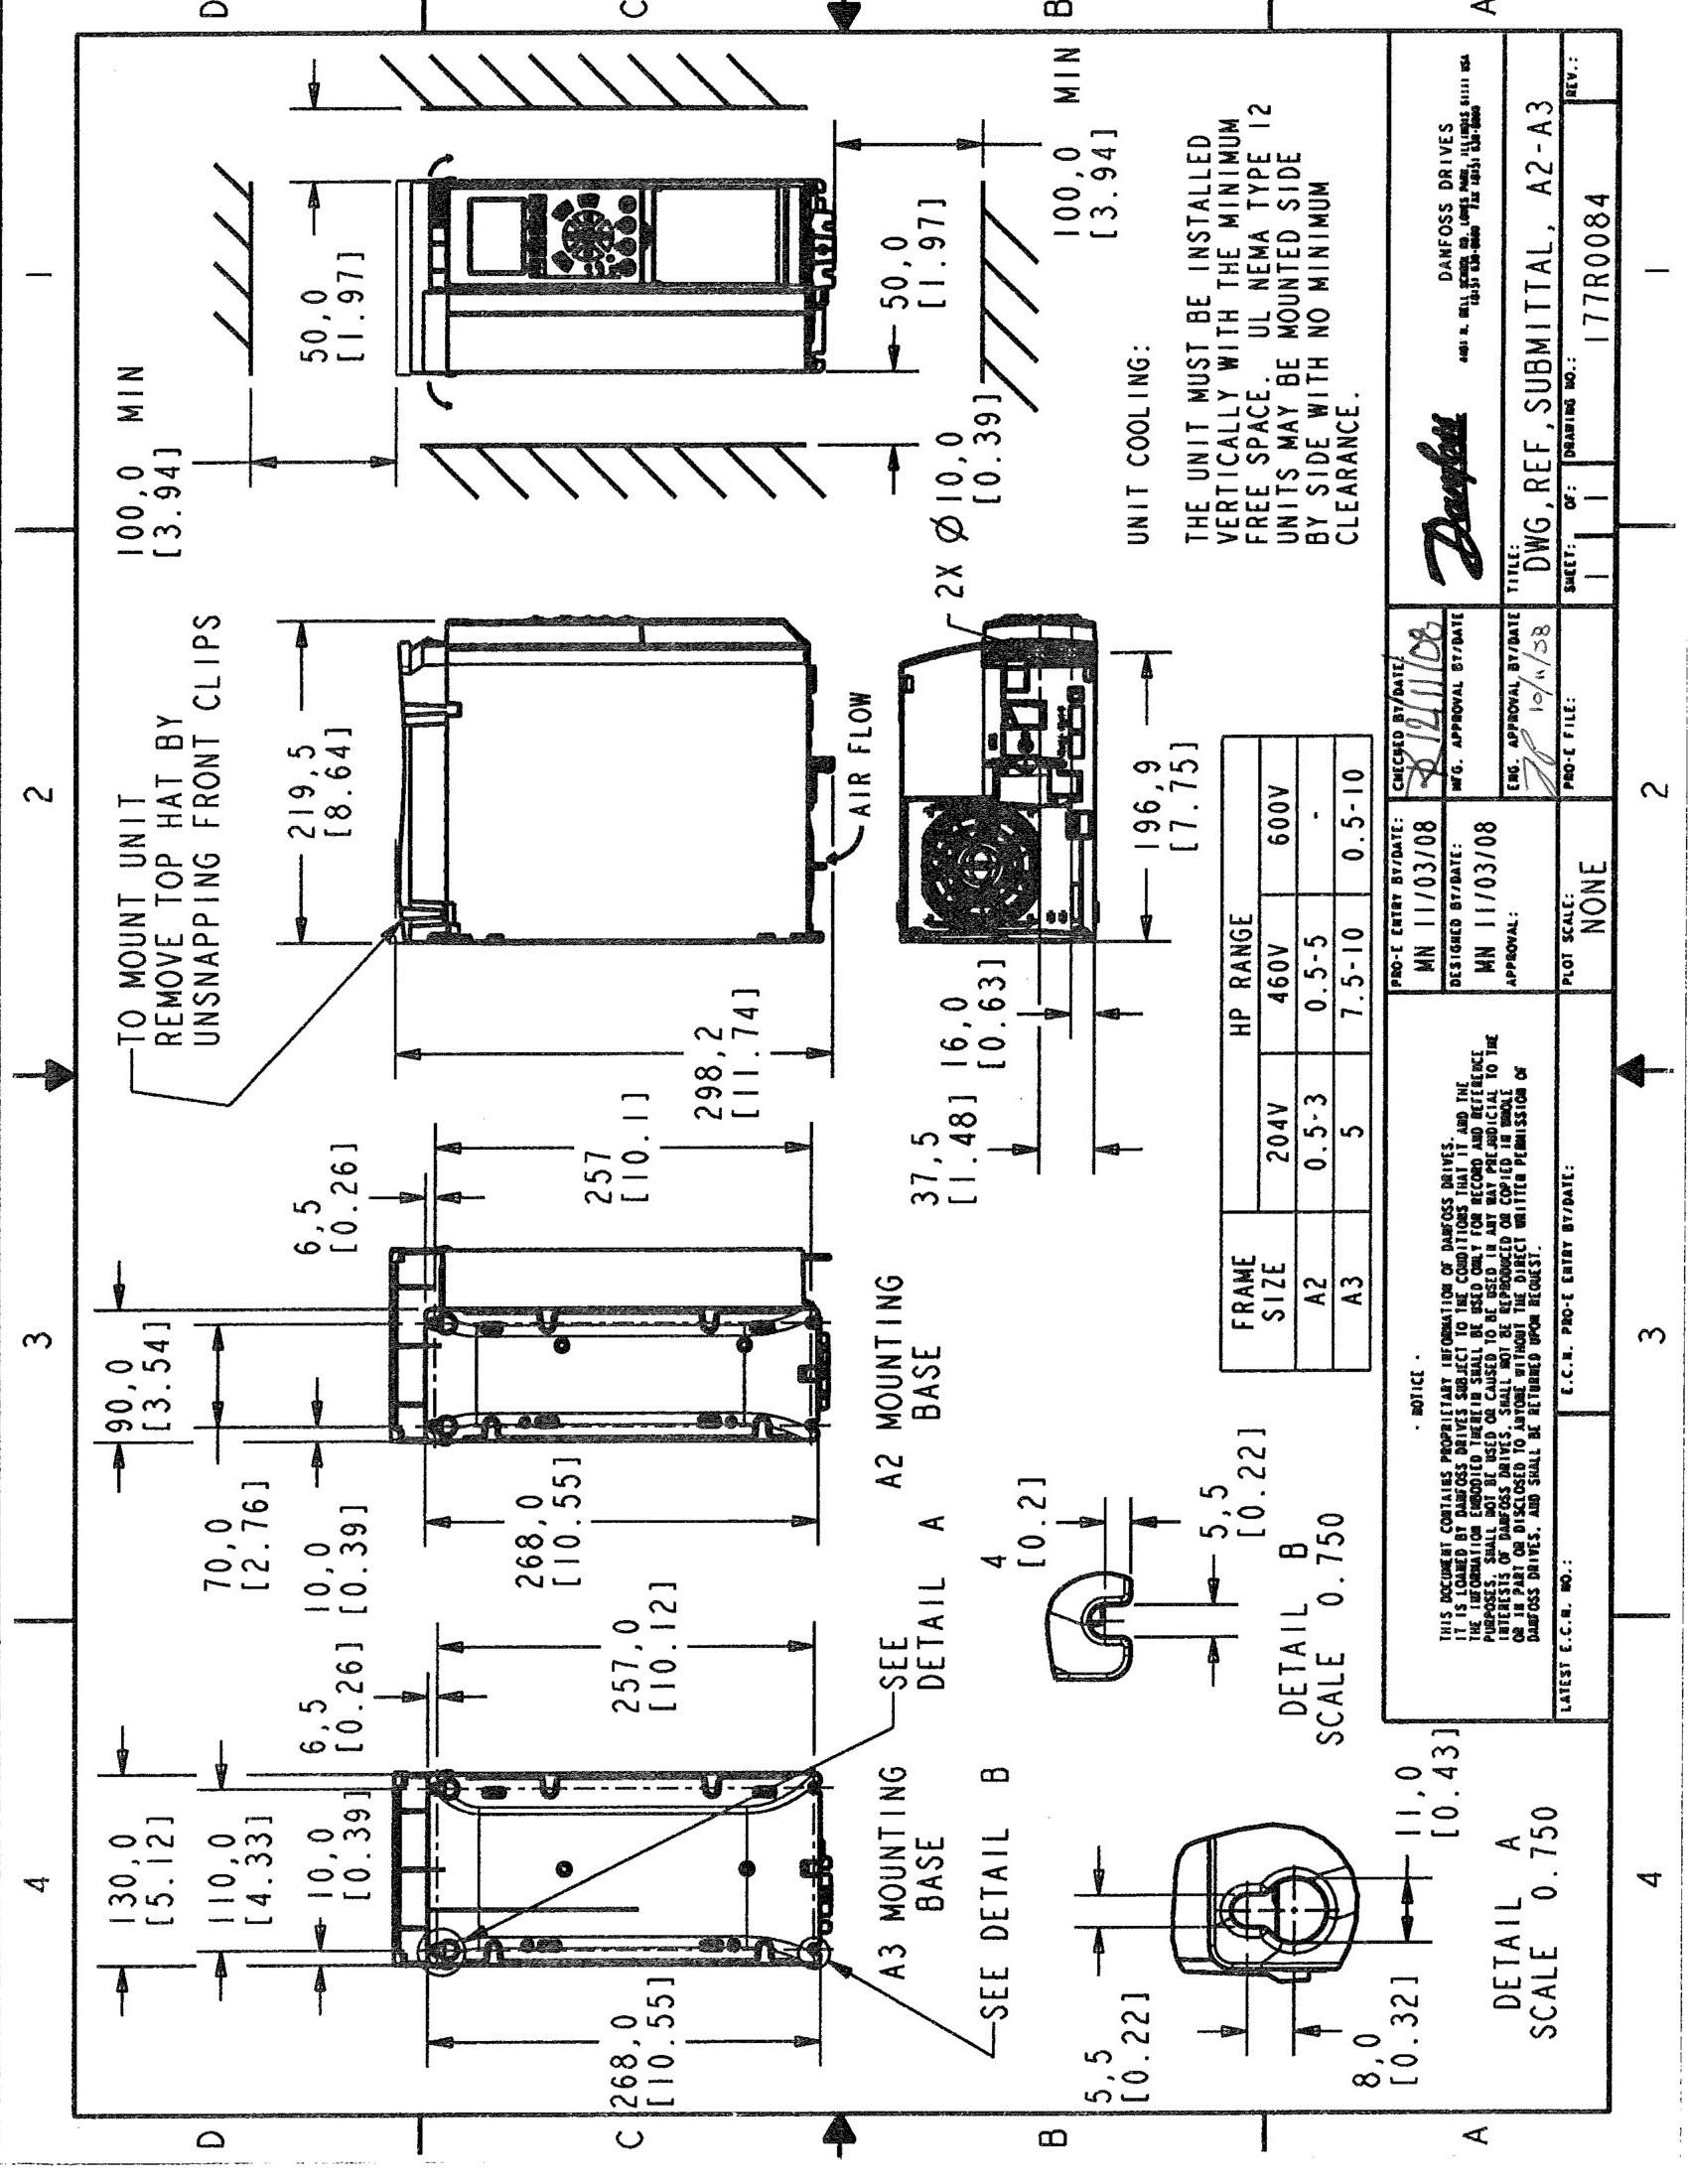 Download Drives Femsa Wiring Diagram 1413685 177r0084 001